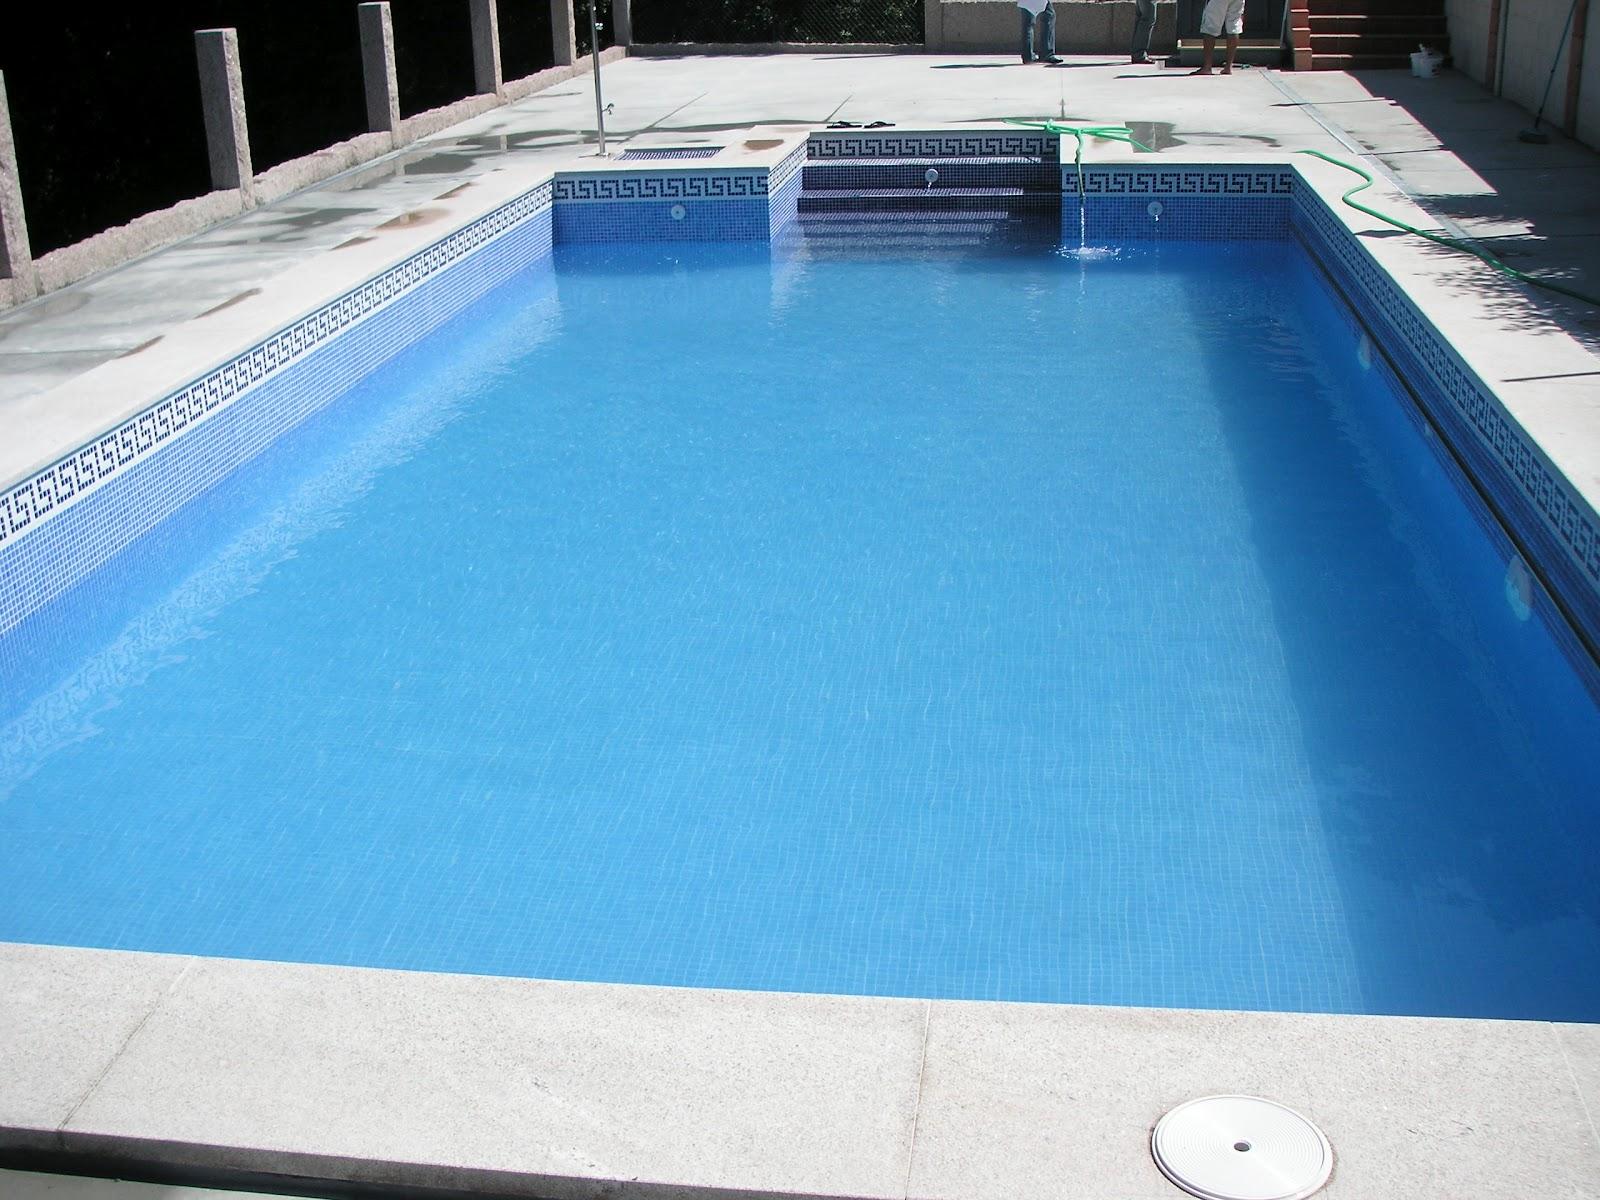 Construcciones pablo p rez alonso s l piscinas - Piscina de obra ...